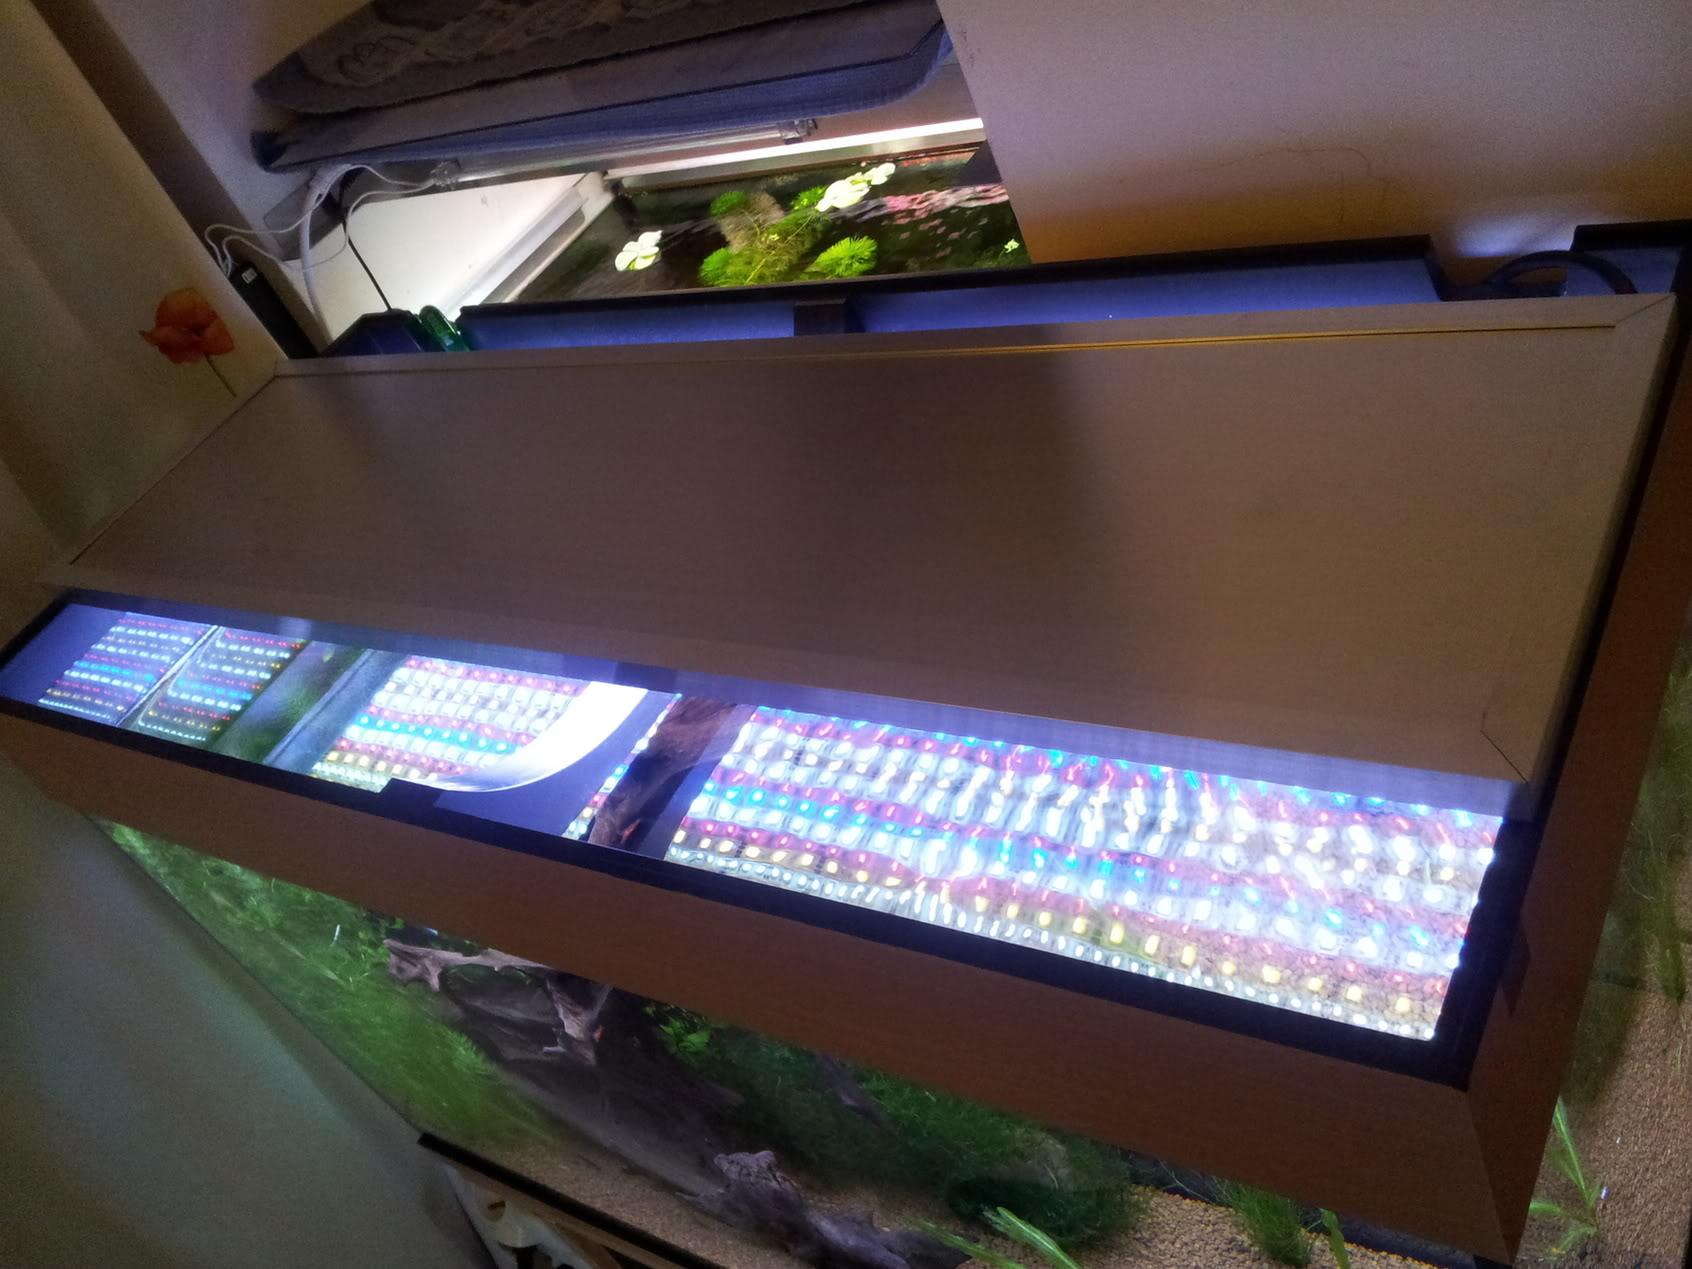 Fabrication galerie LED pour Juwel rio 125 (80cmx20cmx1.8cm) 20120715_205655